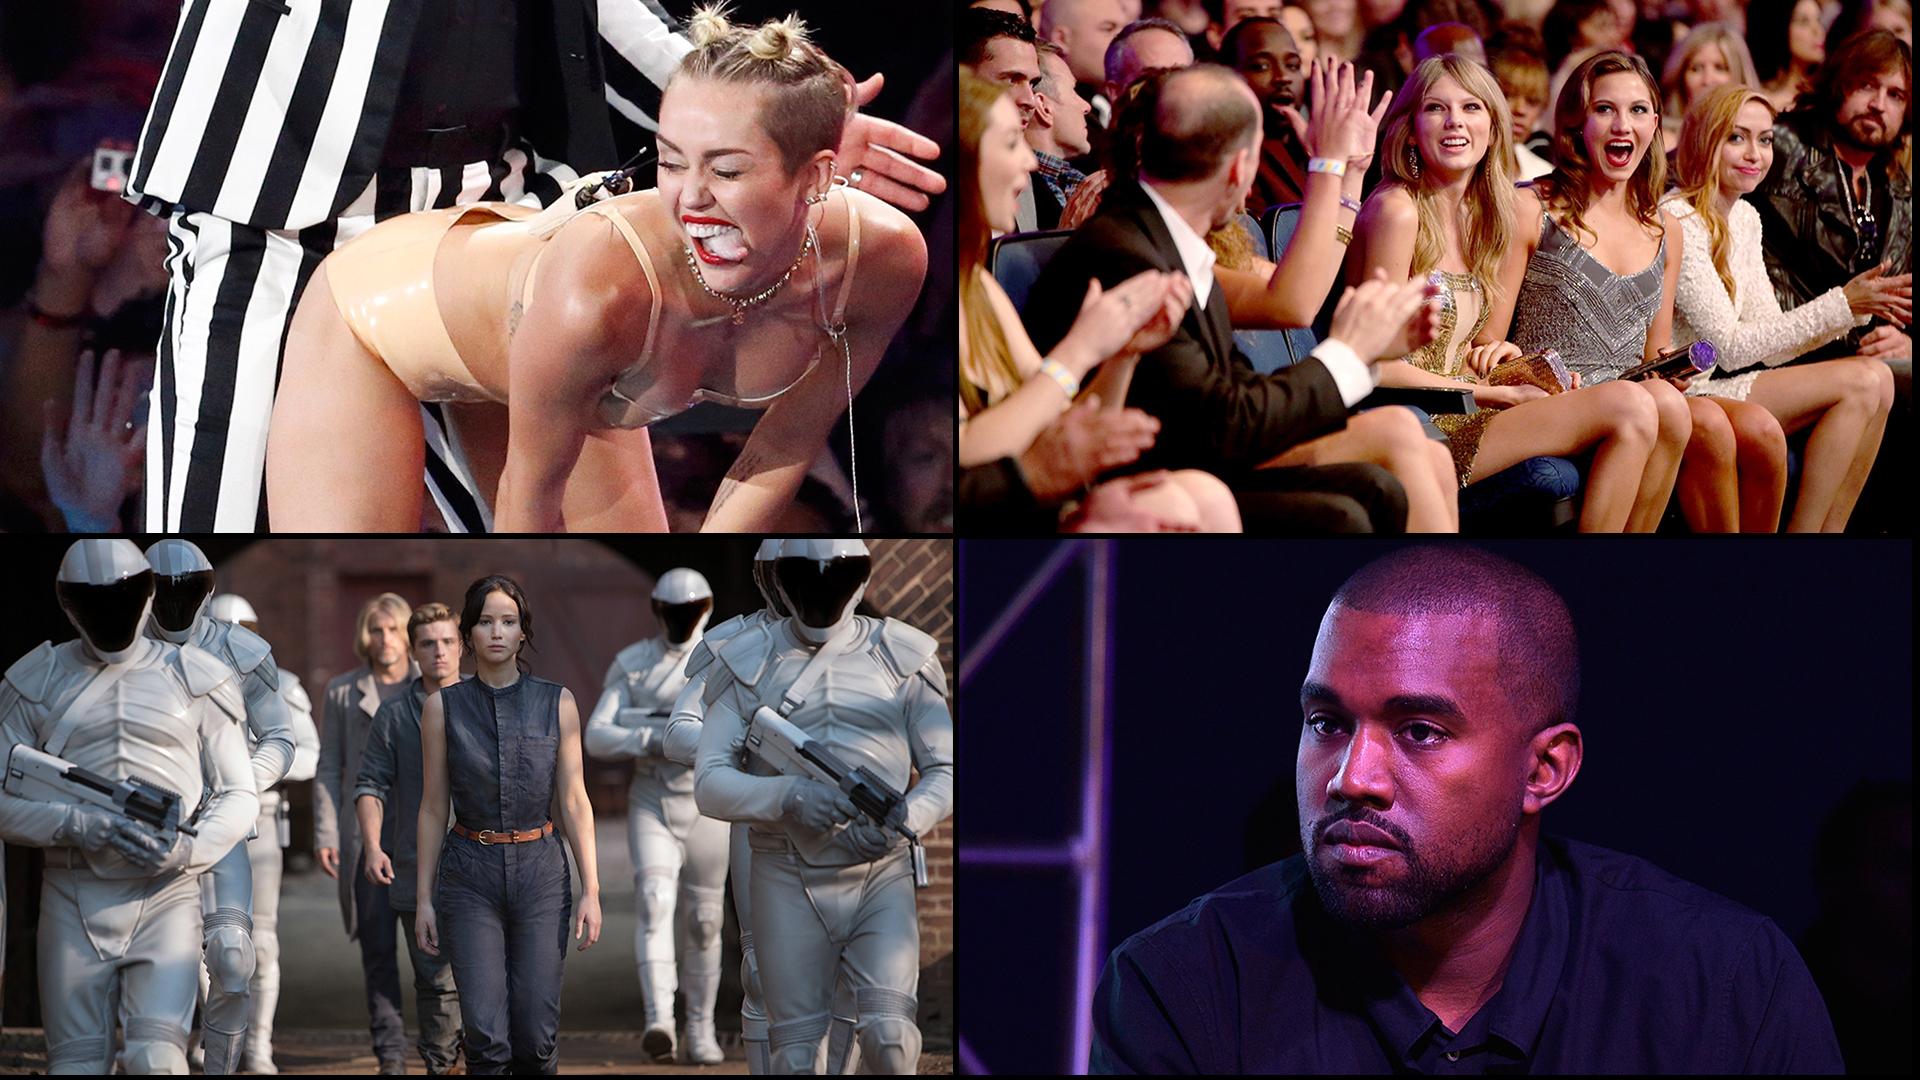 IMAGE: Entertainment trends